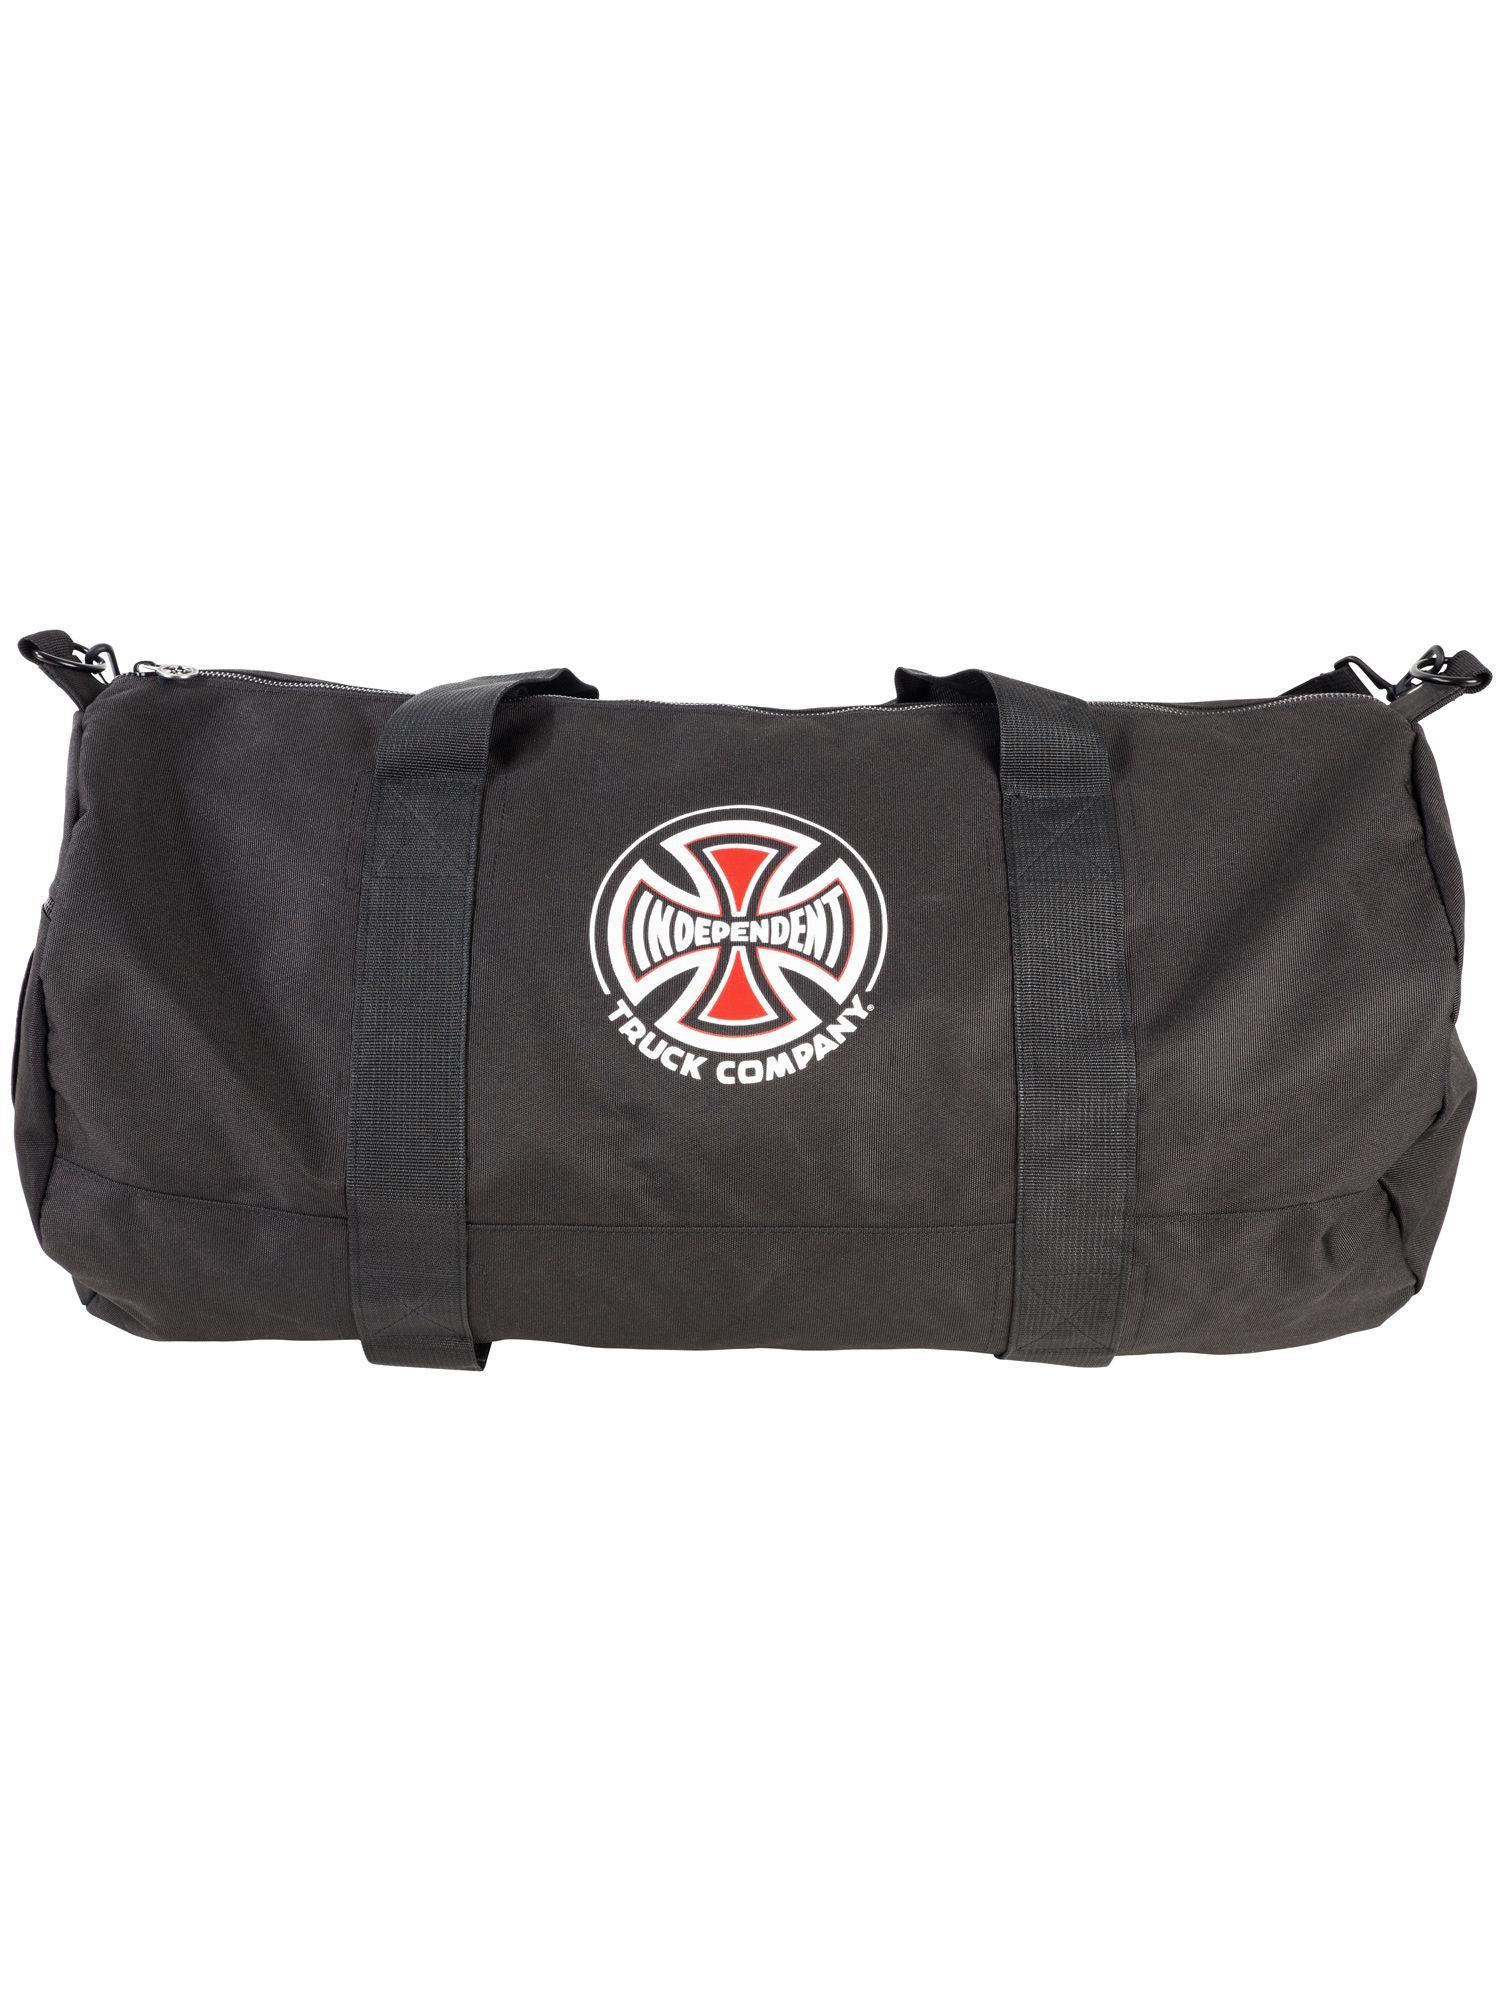 6c31ebb6ed Independent. Seek Dufle Bag